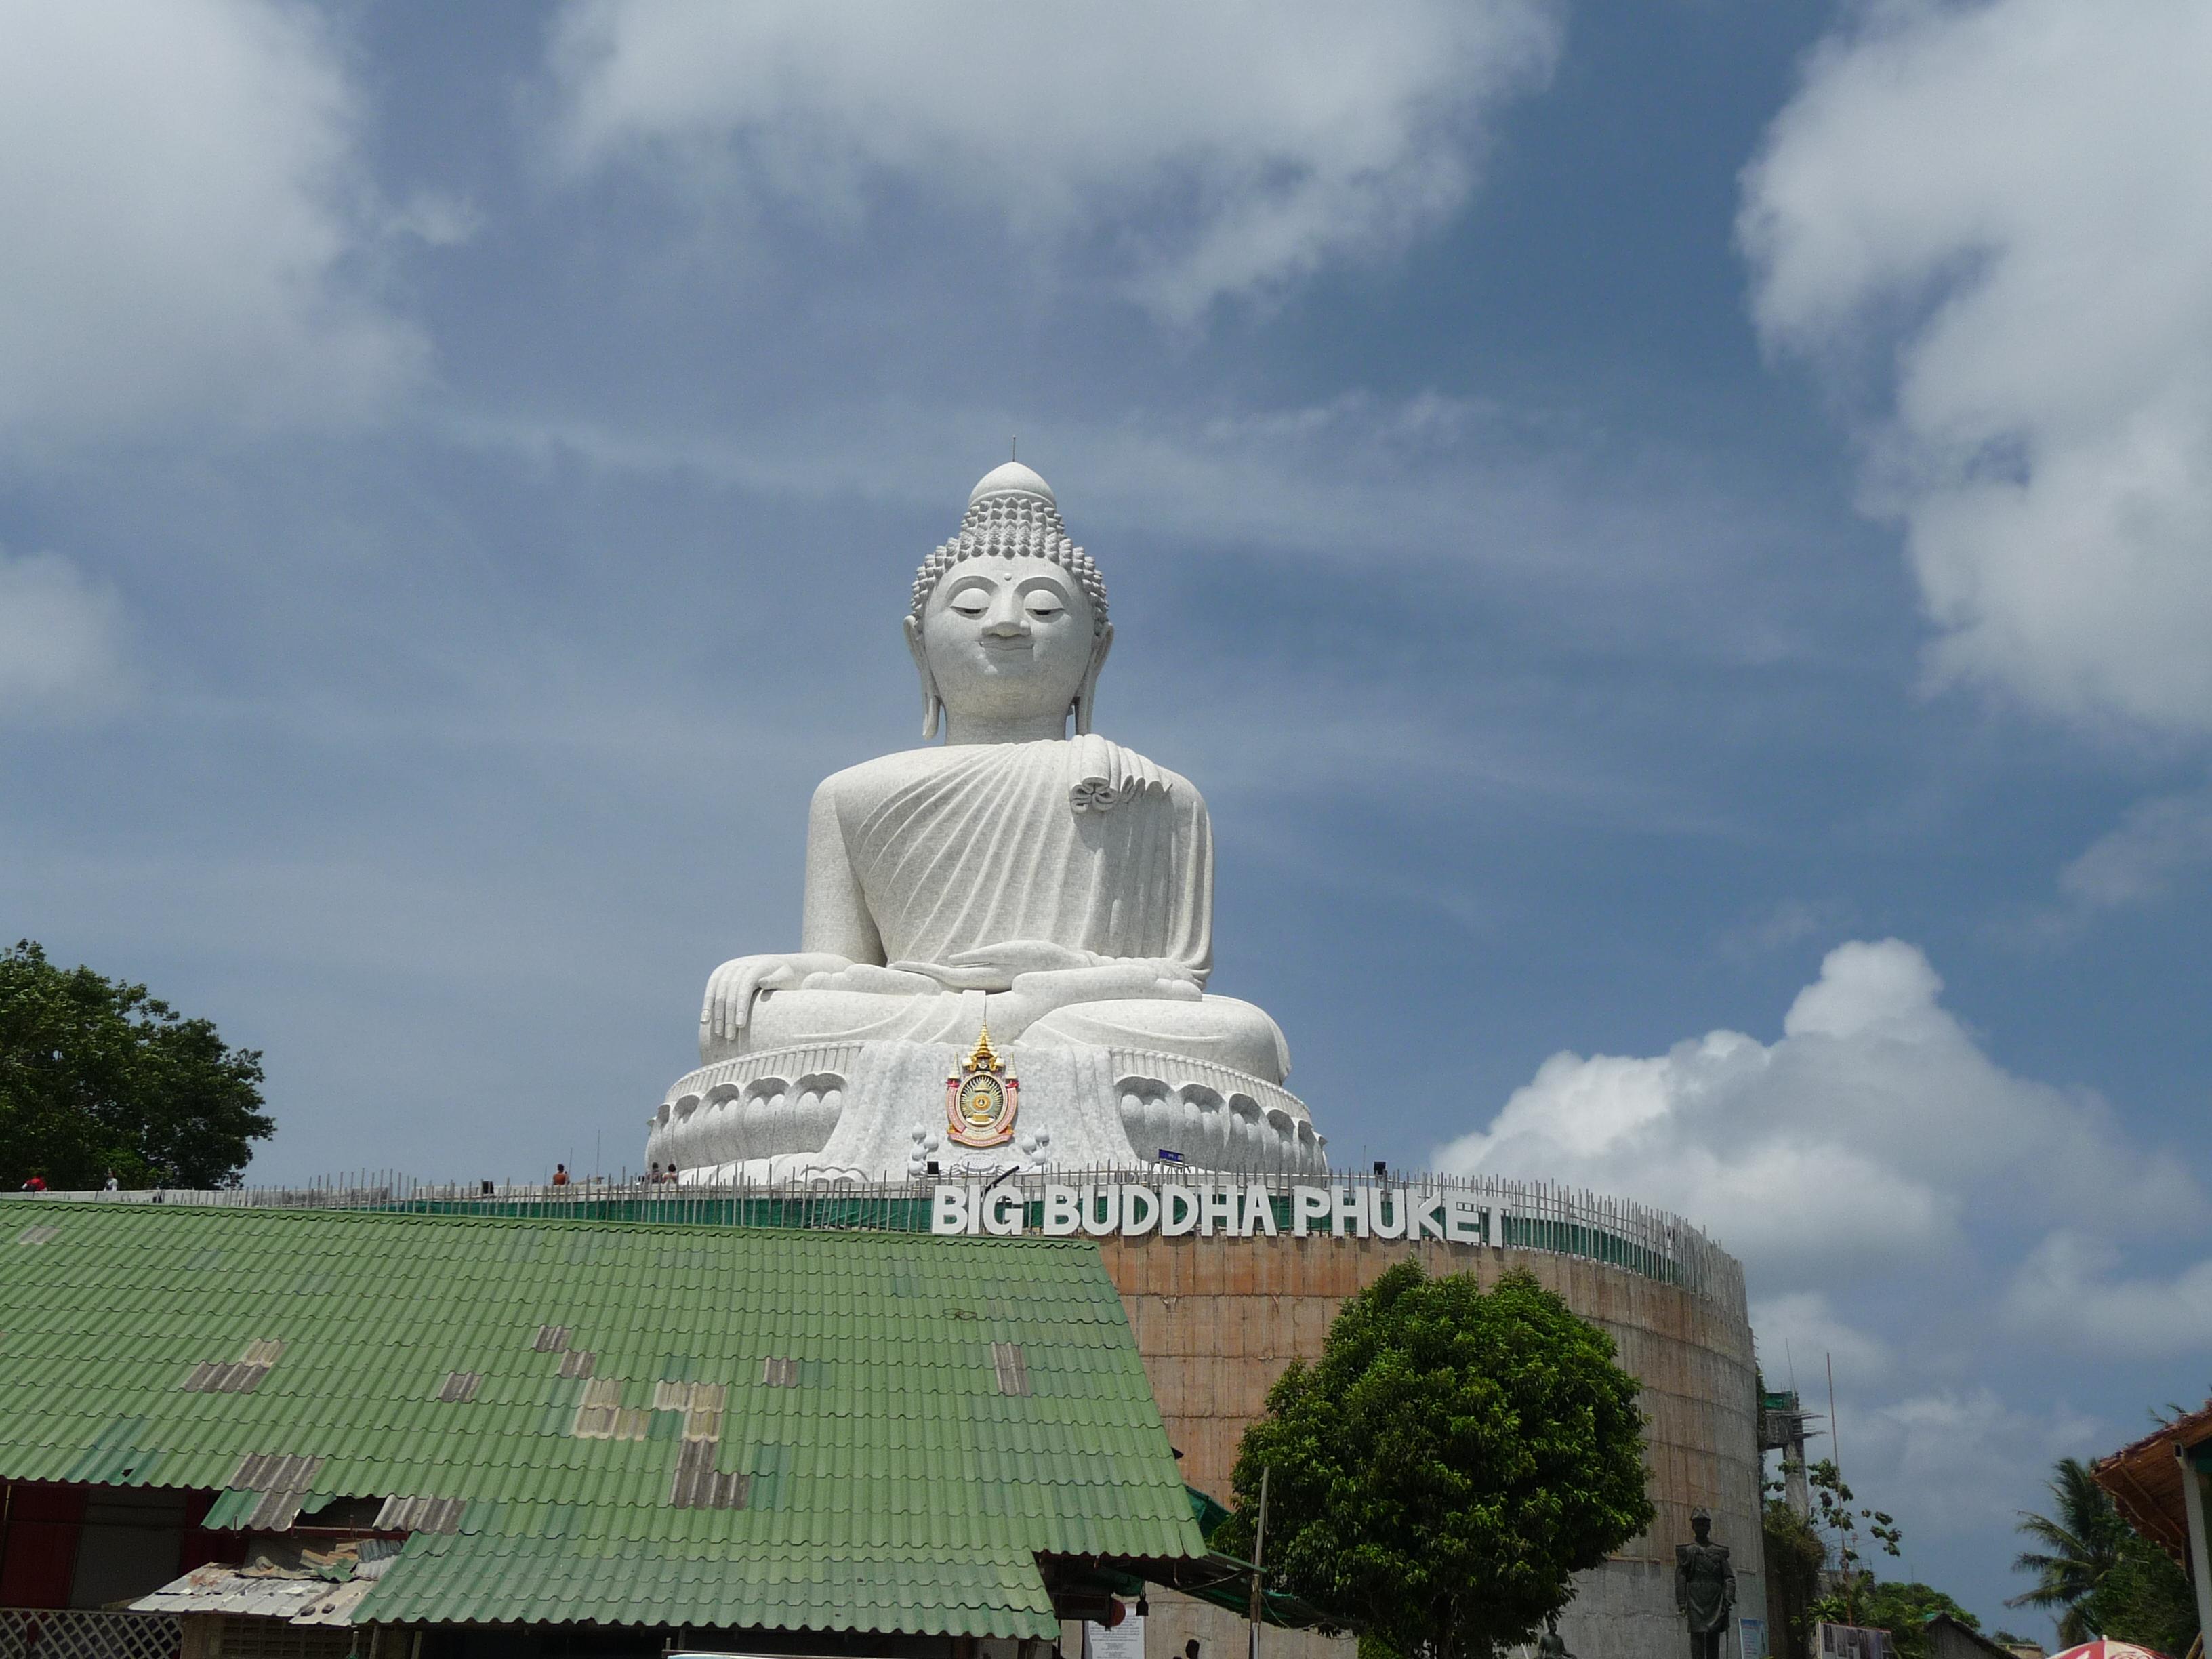 Big Buddha photo 8